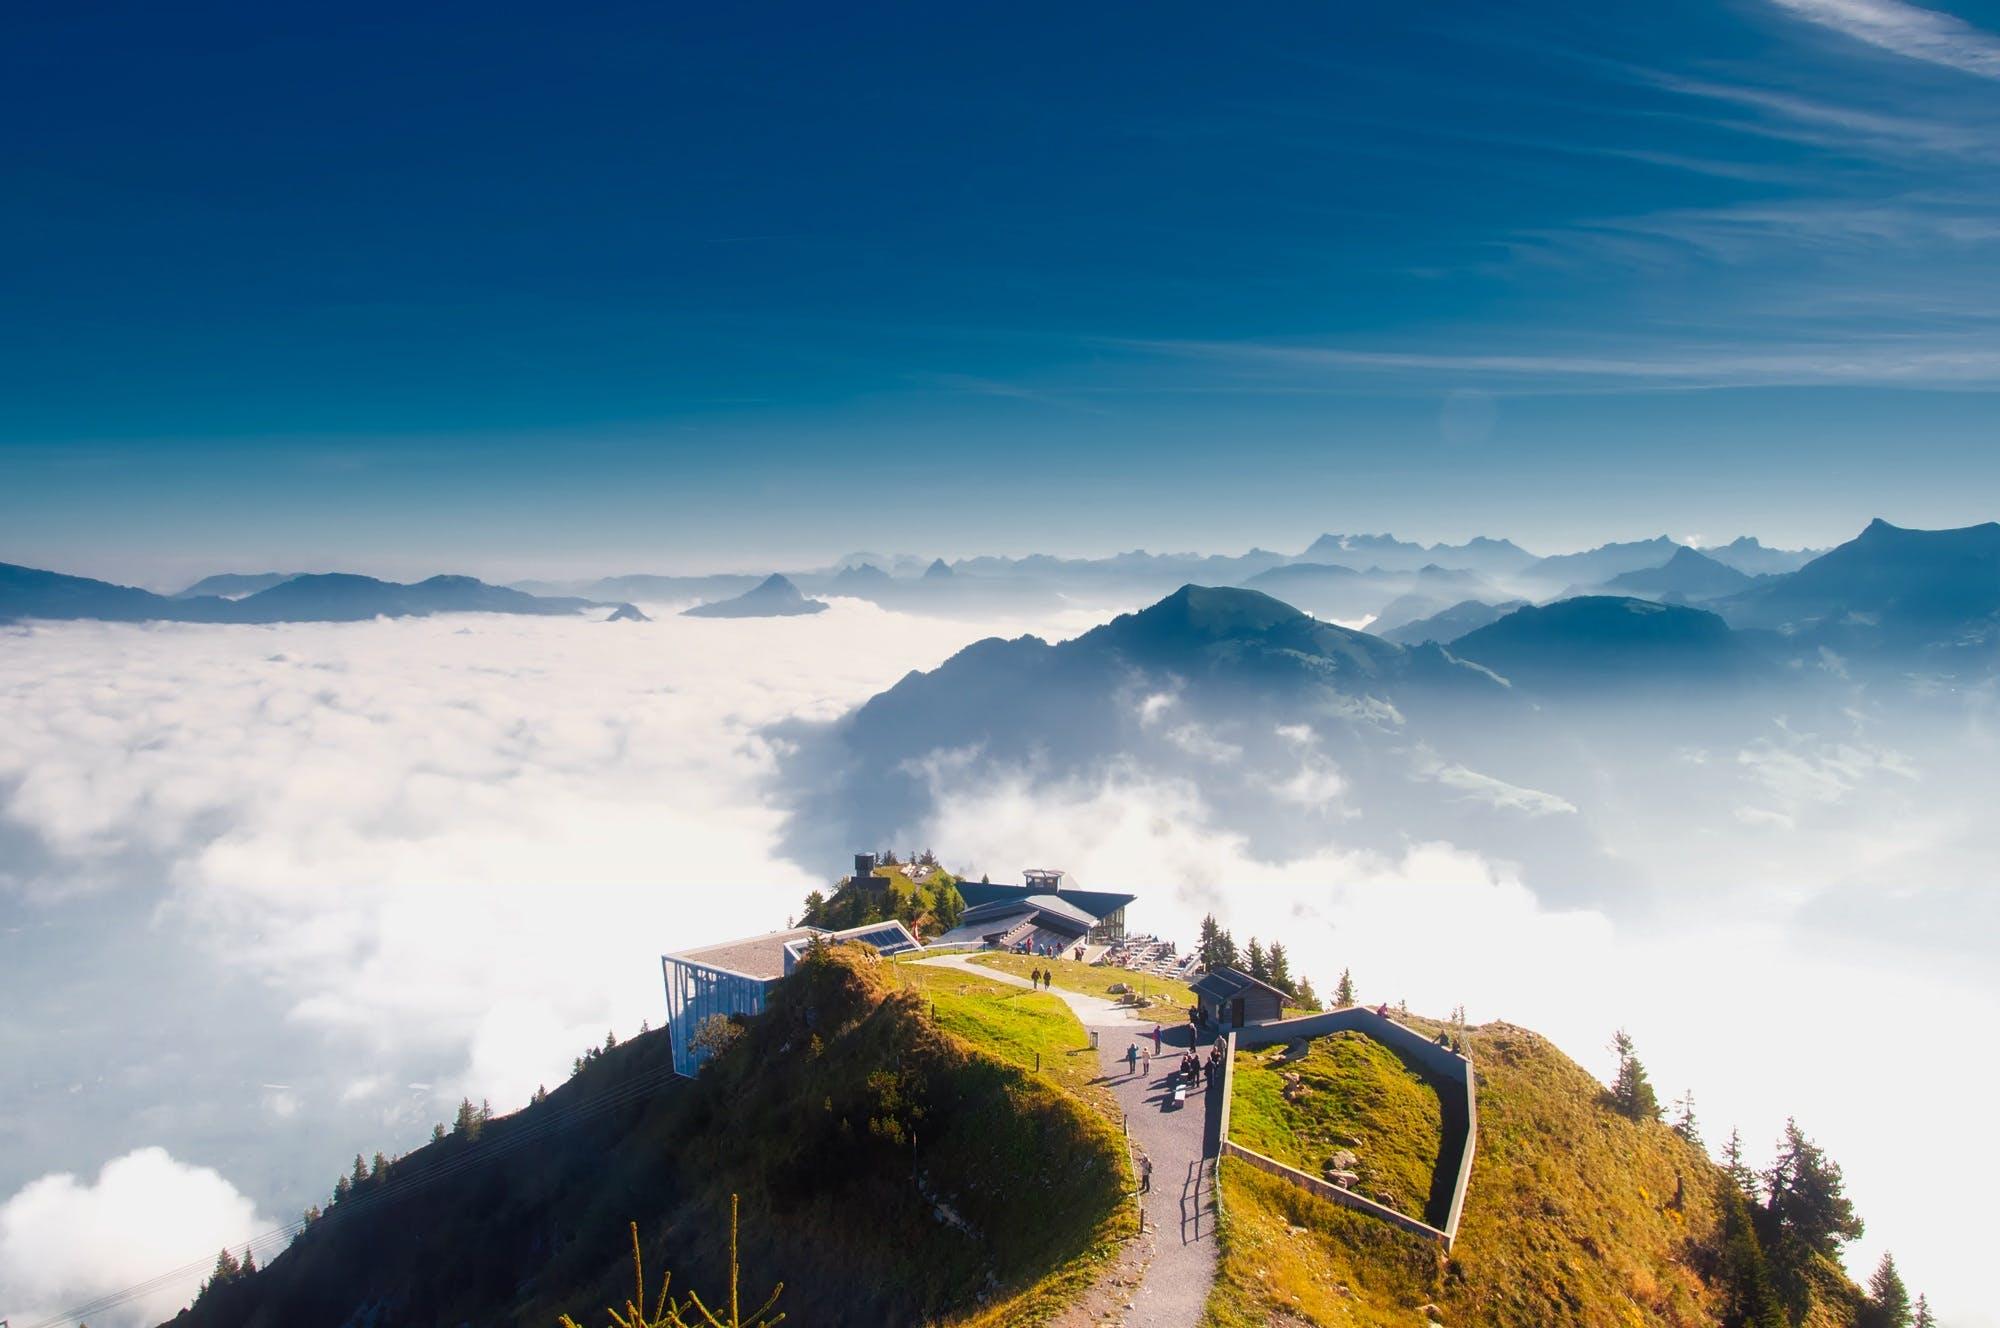 Fotos de stock gratuitas de Alpes, brumoso, césped, cielo